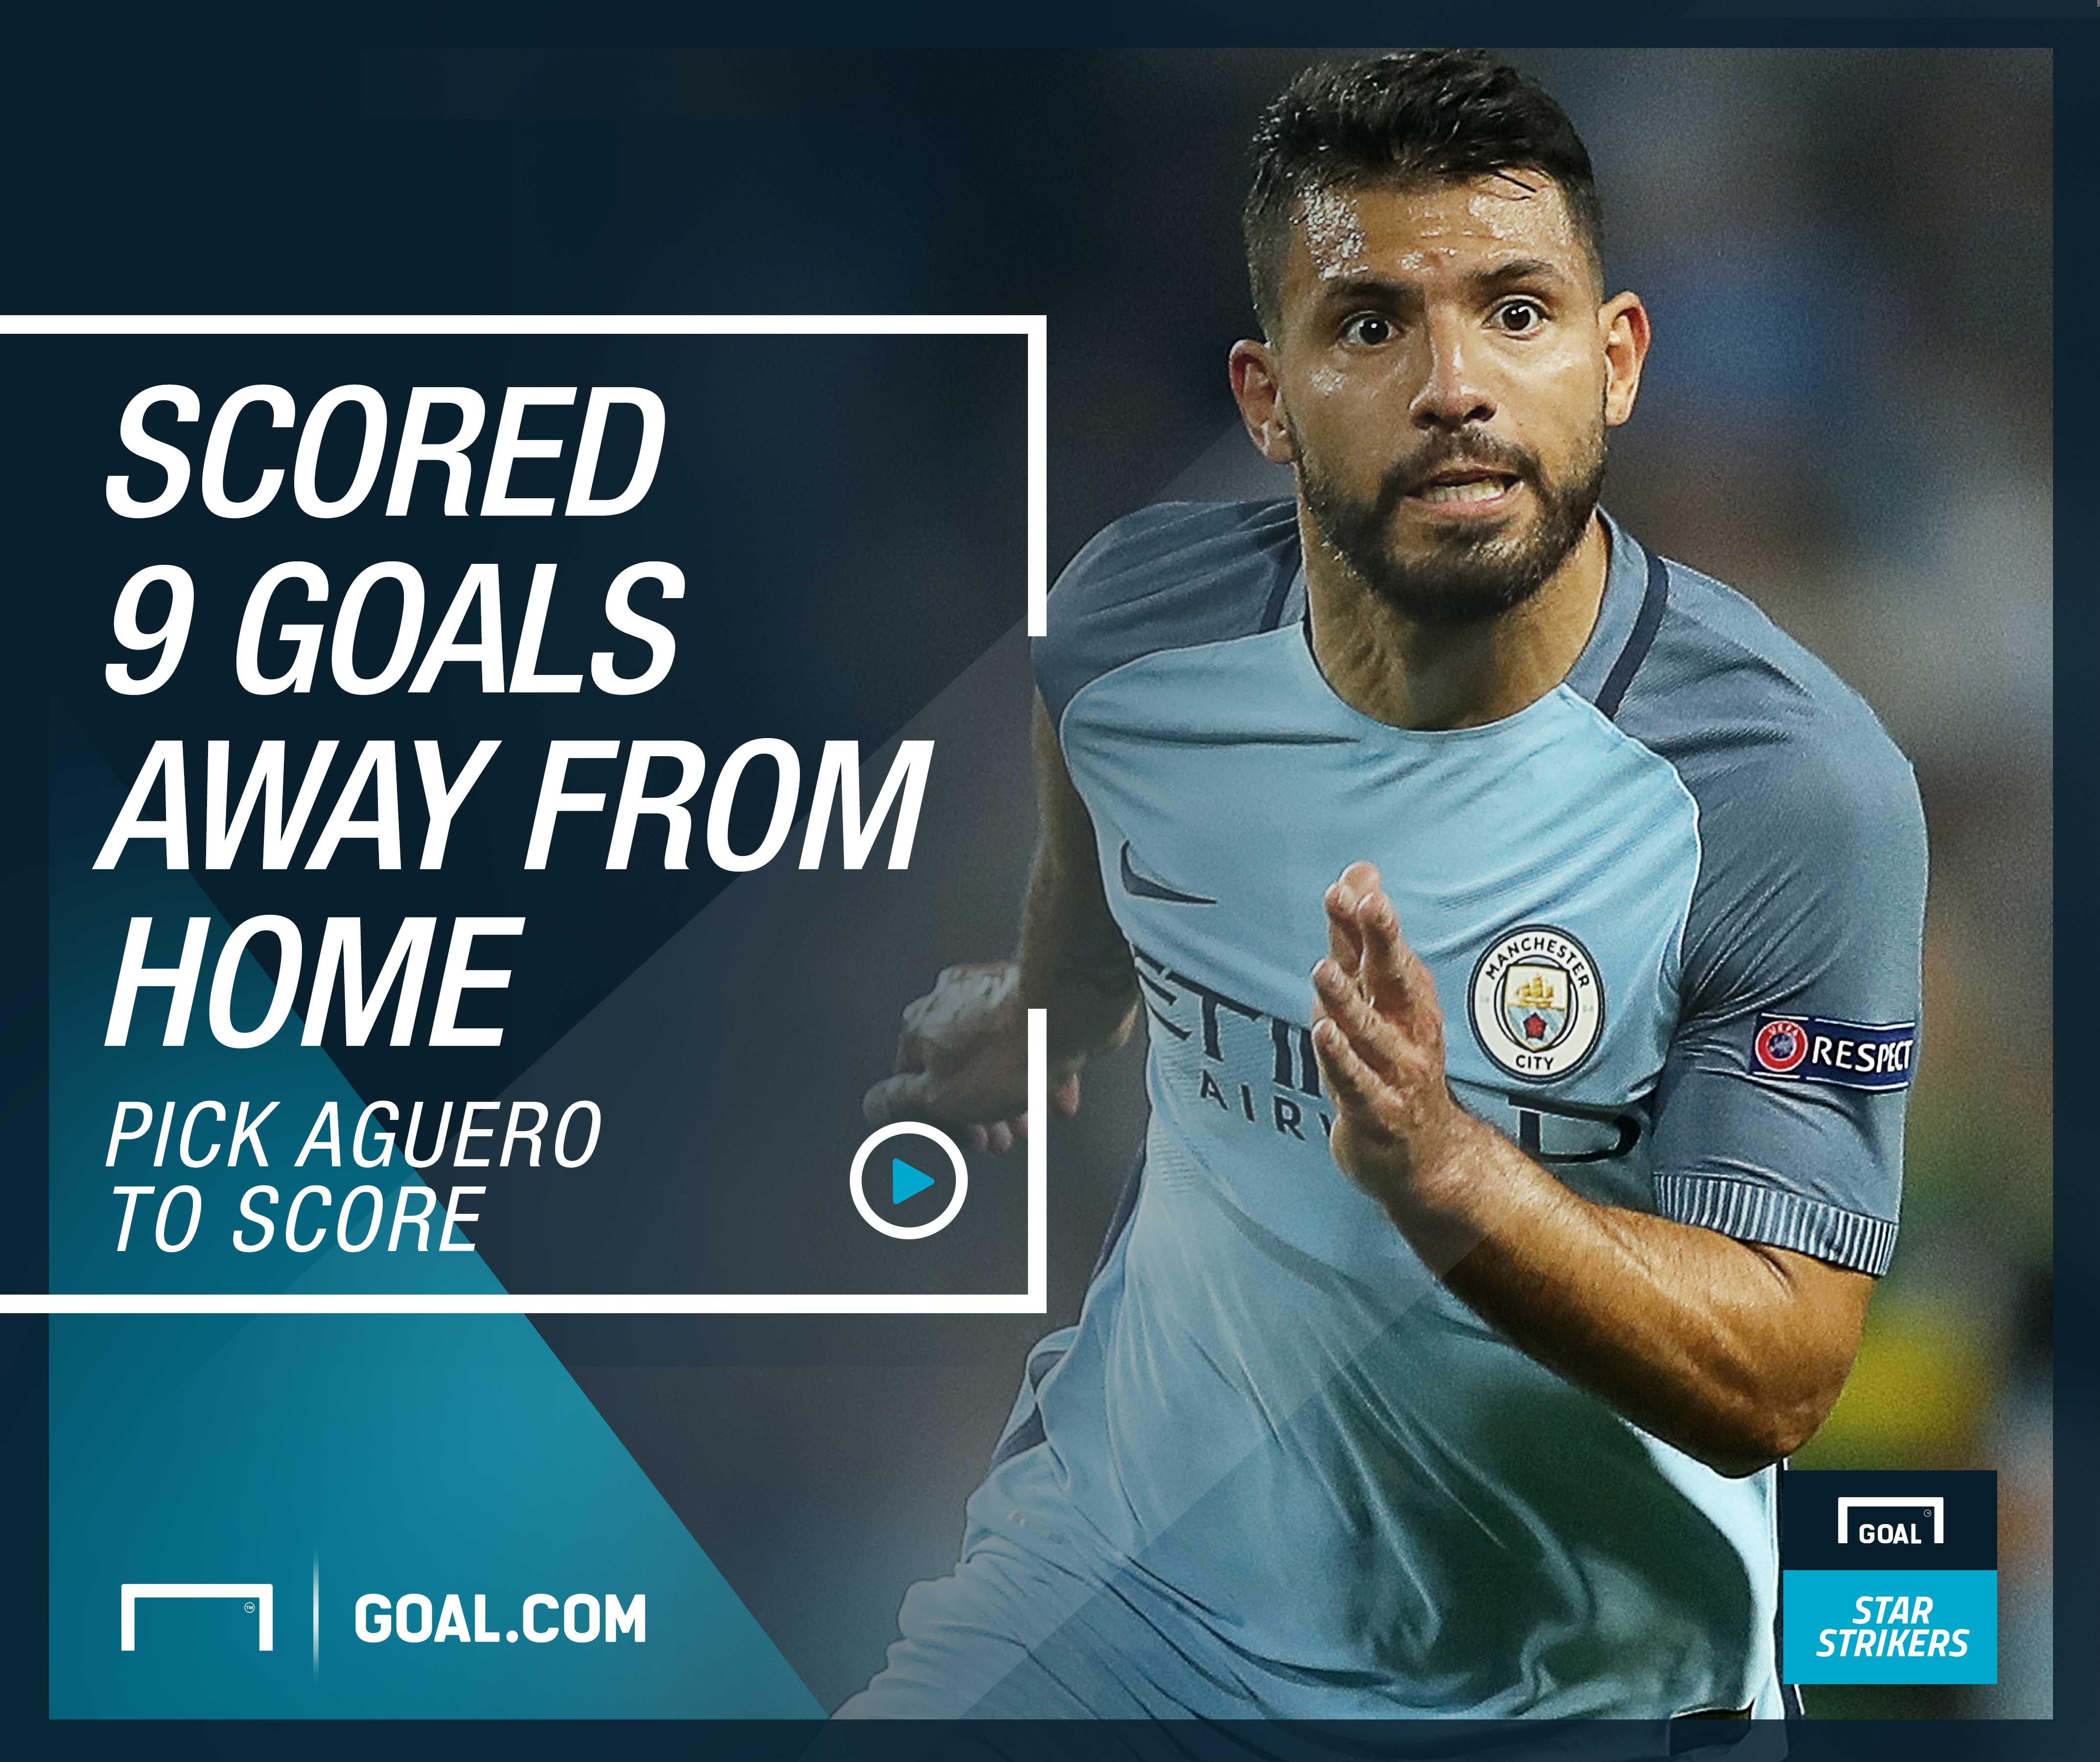 Goal Star Strikers - Aguero